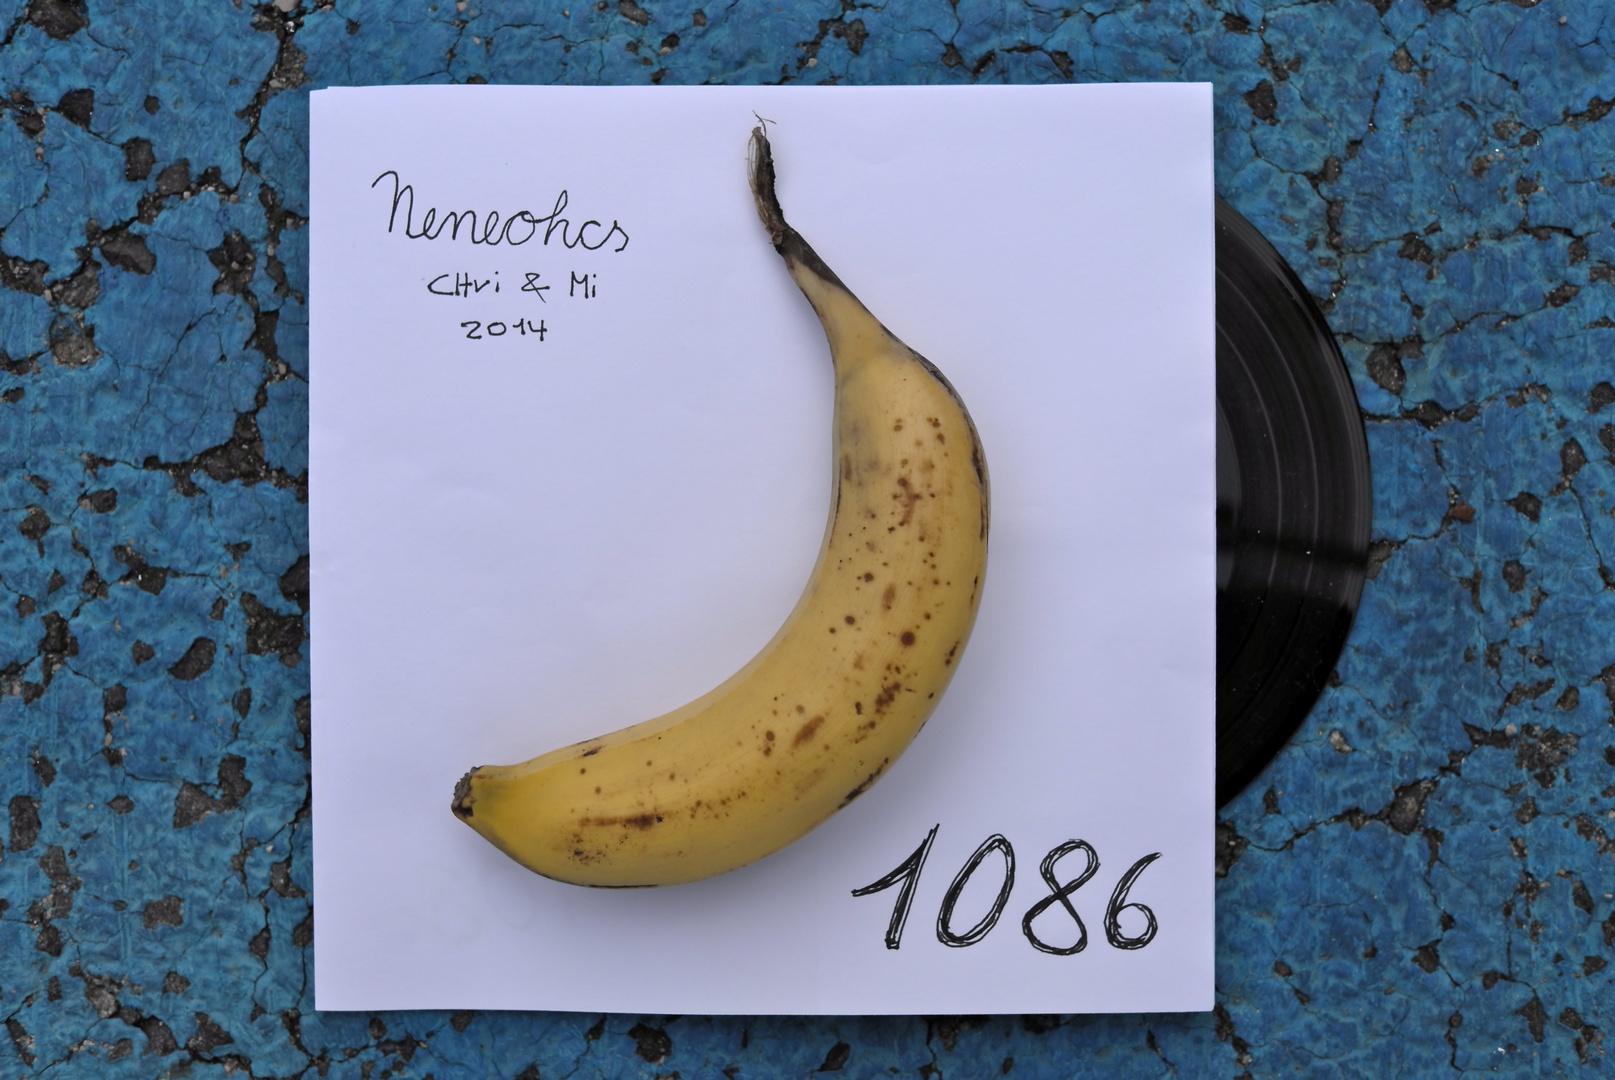 Andy Warhol, Velvet Underground Cover Tribute